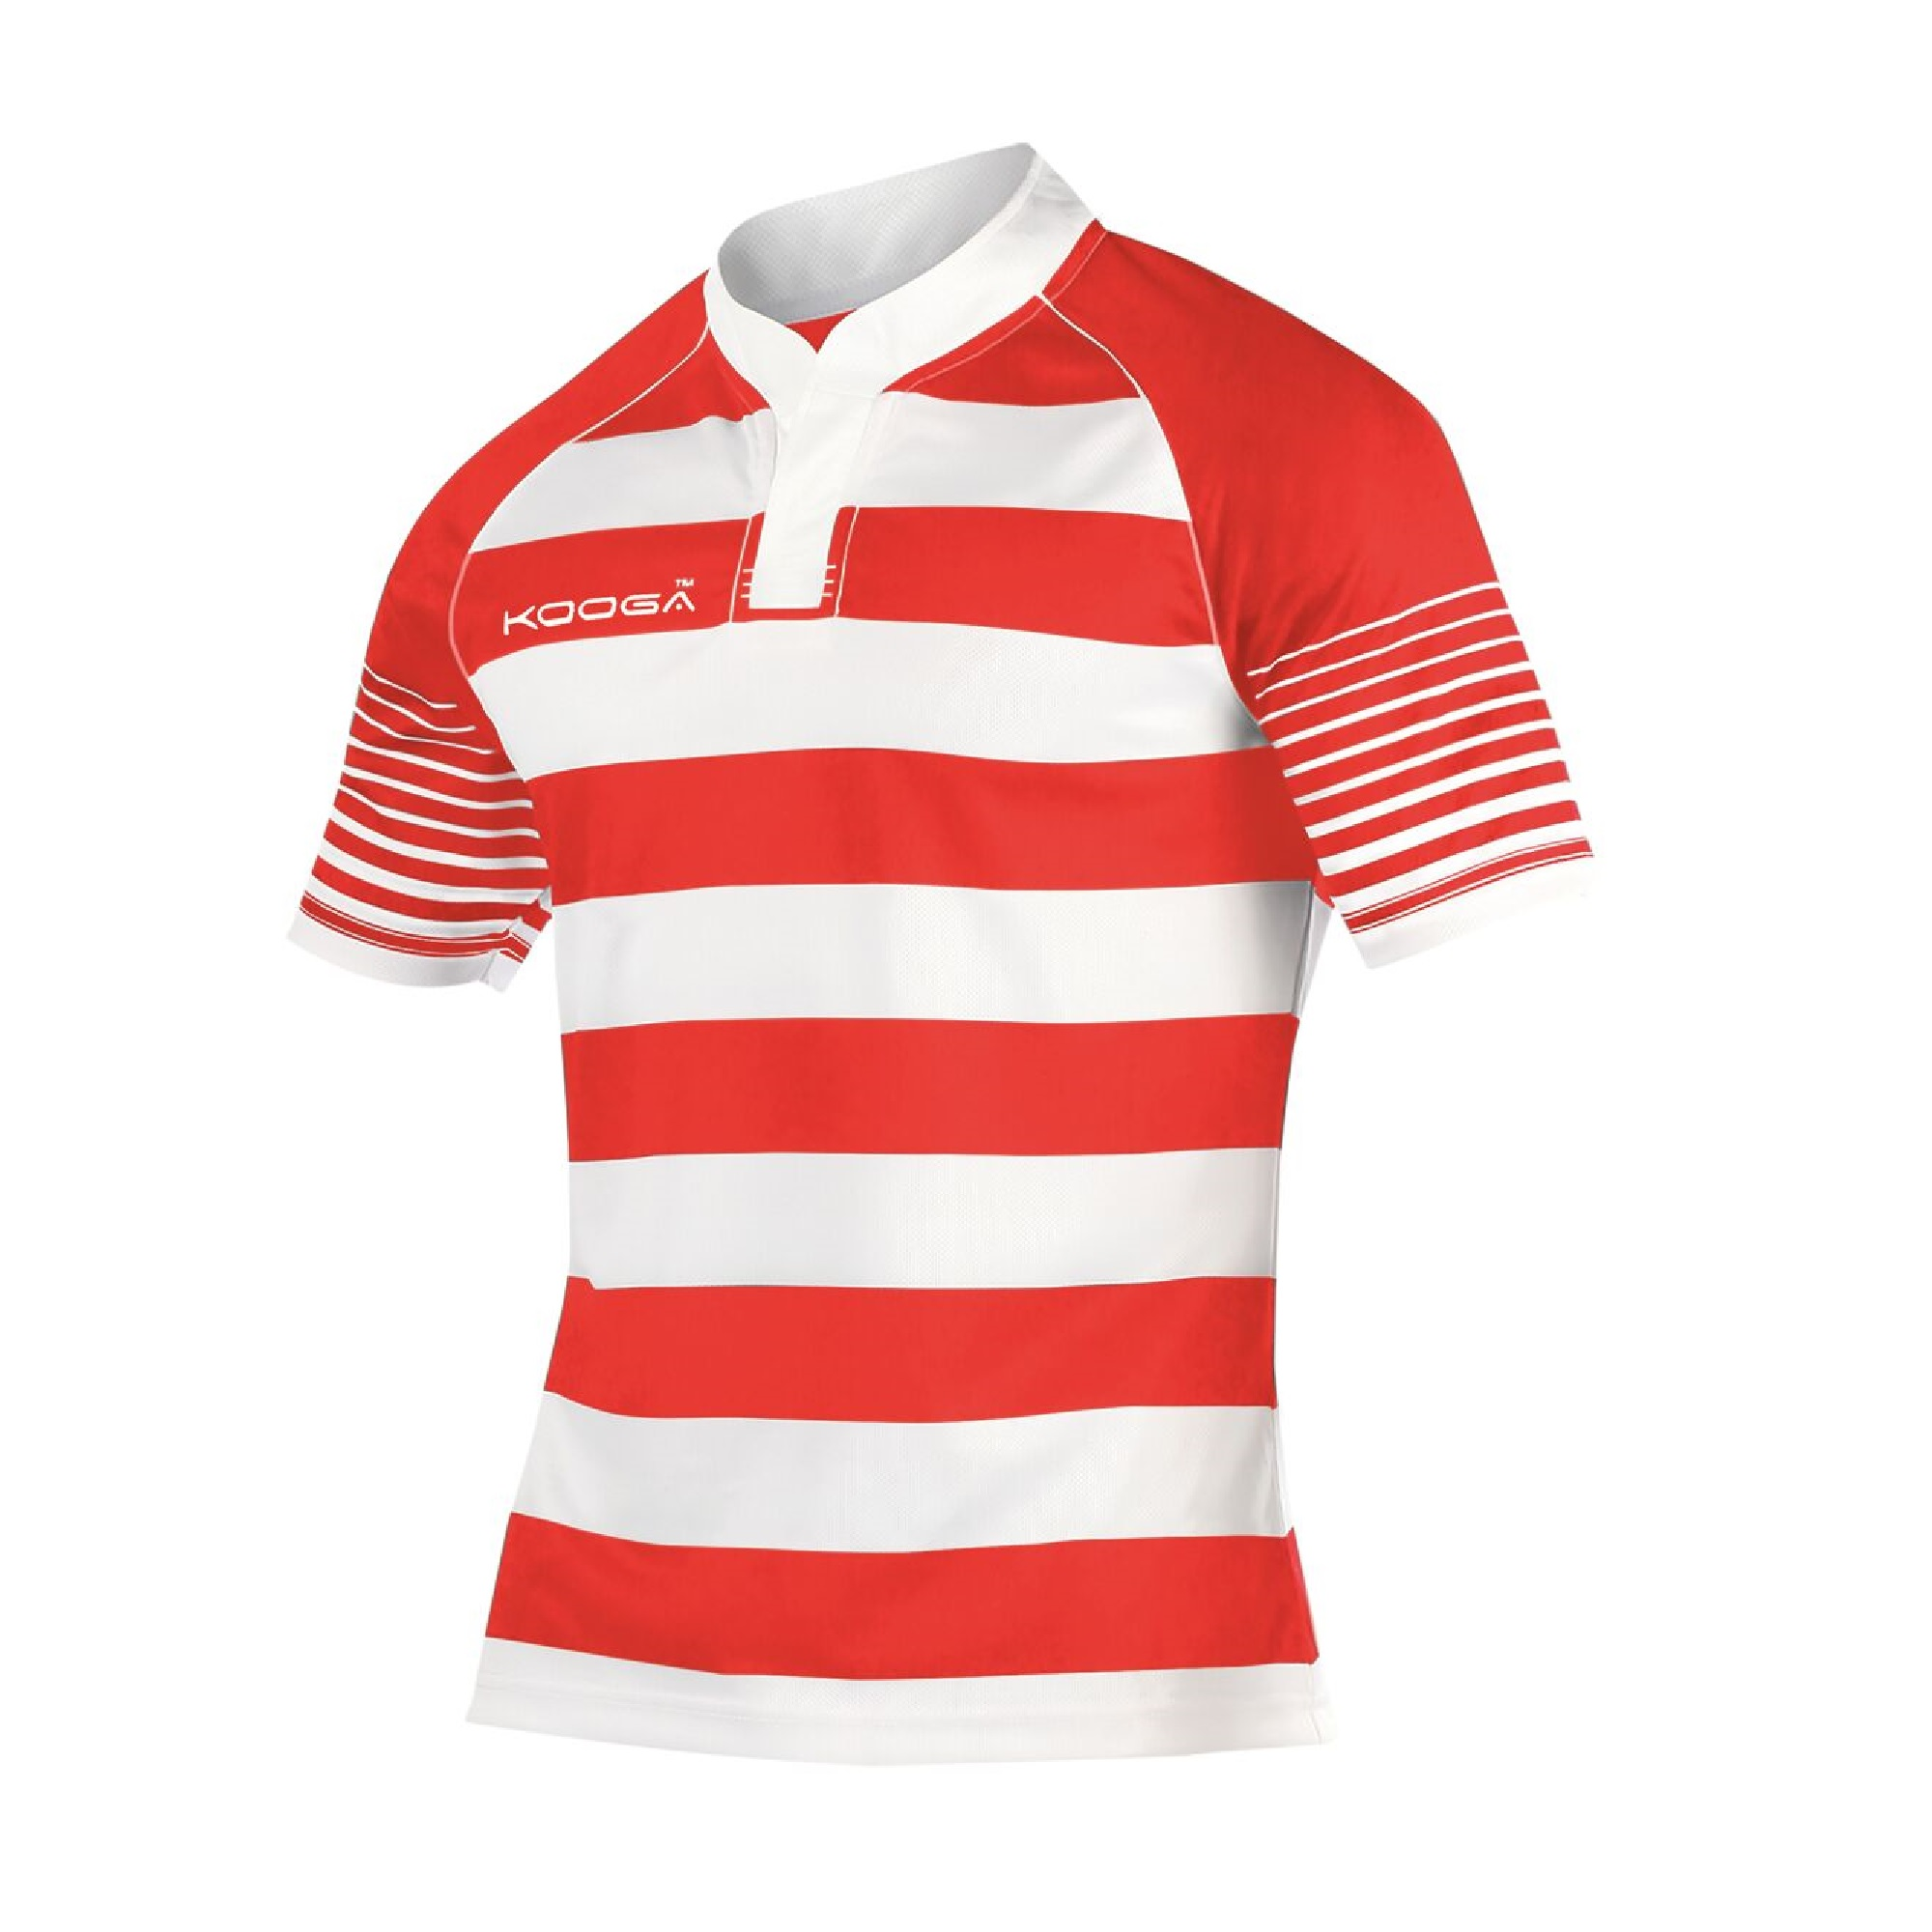 Double standards irritate me Tee T Shirt Shirt Shirt long sleeve Hoodie tank top 3fe9f9